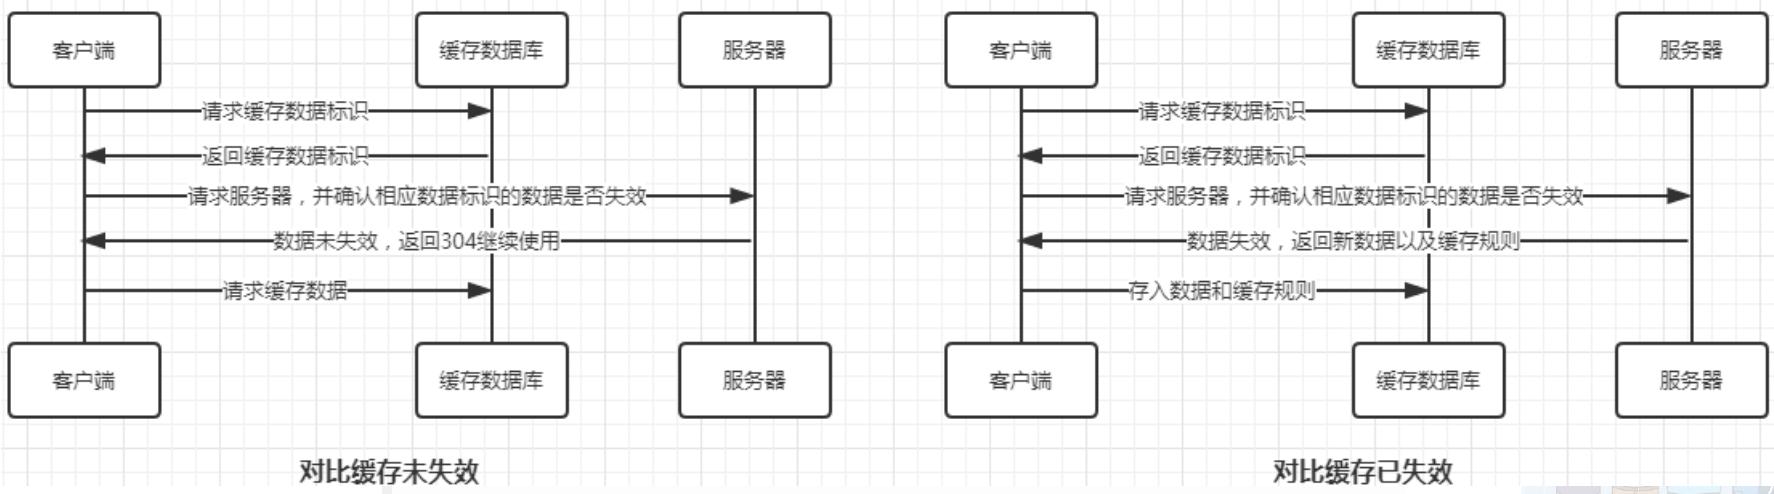 Nginx缓存机制详解 - 对比缓存示意图